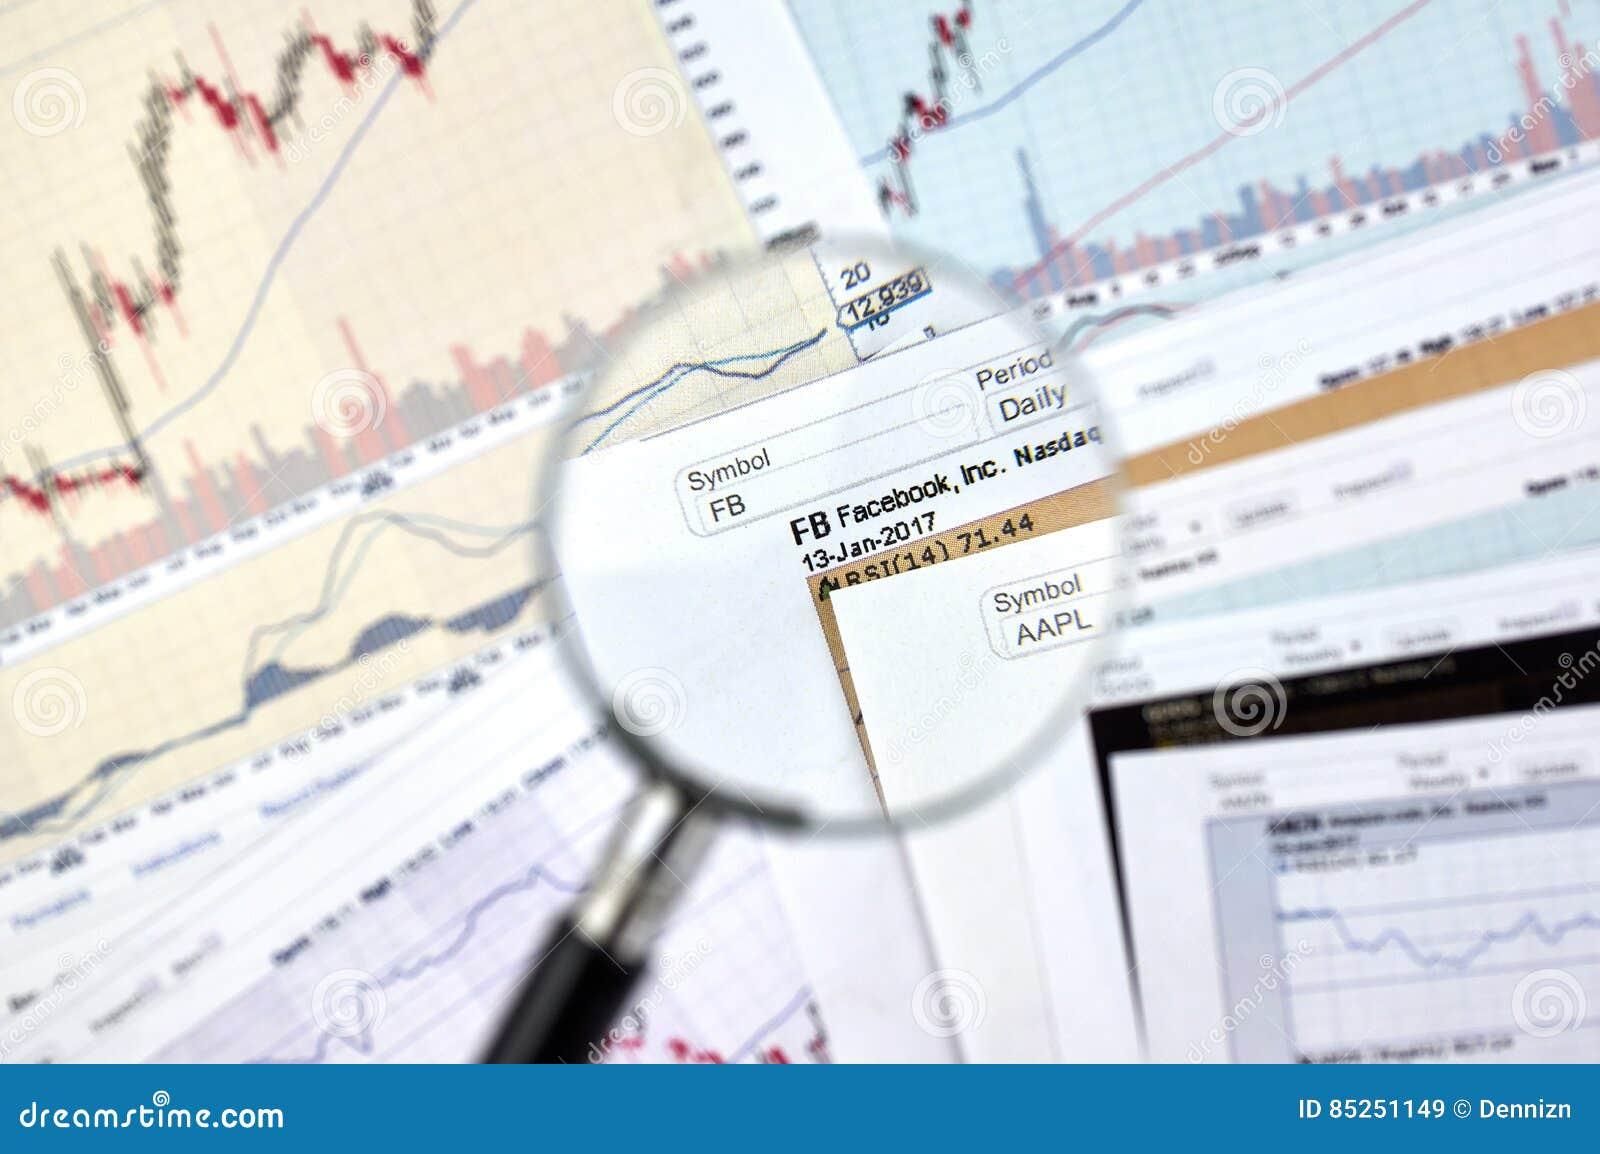 Fb ticker candlestick graphs editorial stock image image 85251149 fb ticker candlestick graphs buycottarizona